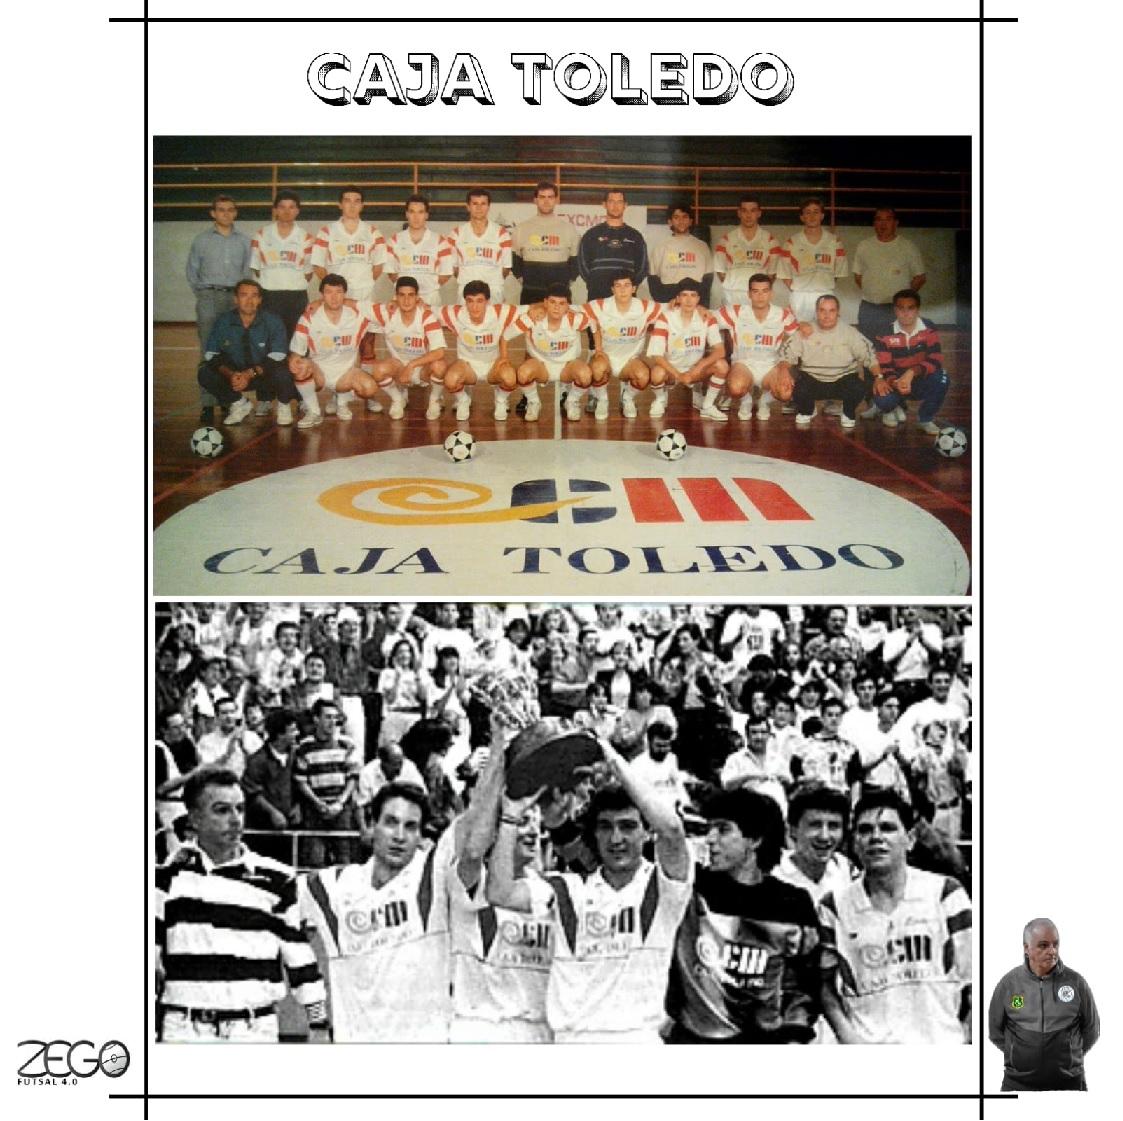 Legendary futsal coach Zego discuss his life in futsal with Futsal Focus